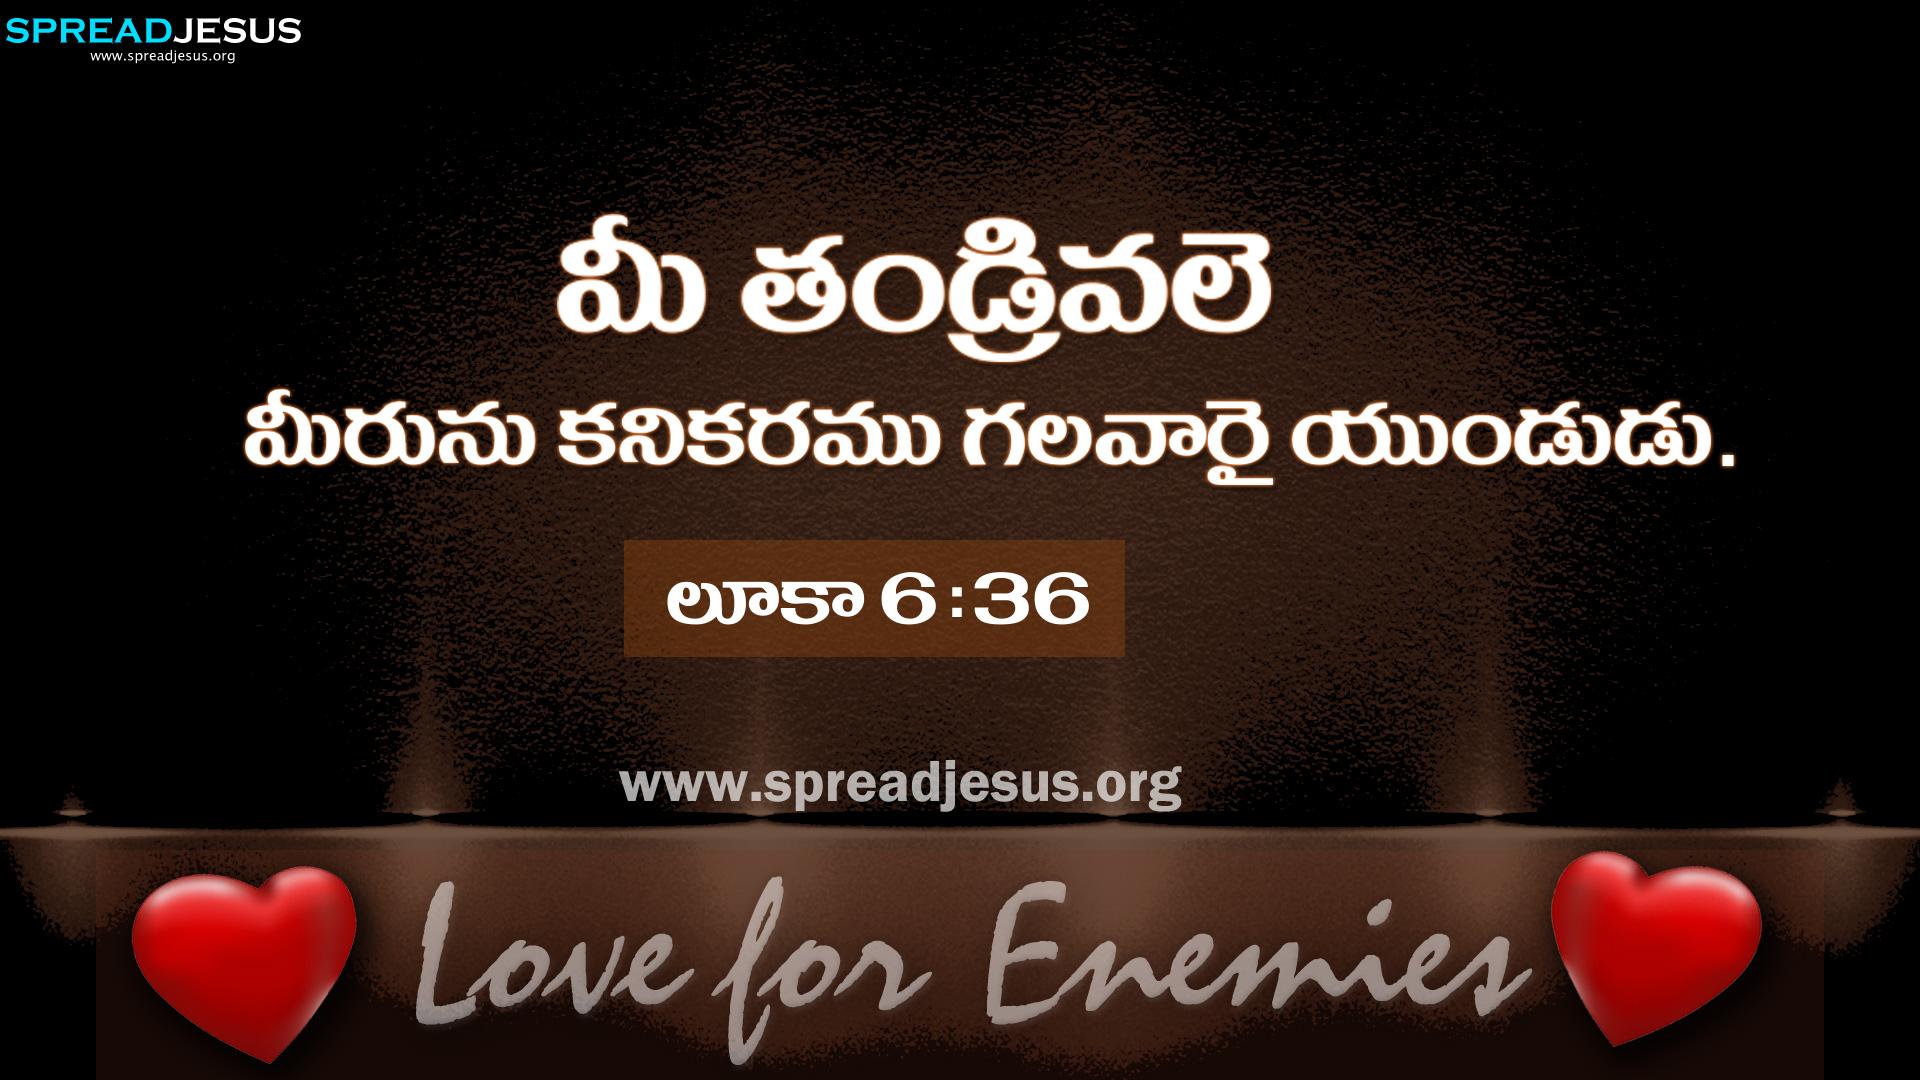 Fantastic Wallpaper Love Telugu - TELUGU-BIBLE-QUOTES-HD-WALLPAPERS-LUKA-6_36  Trends_873412.jpg